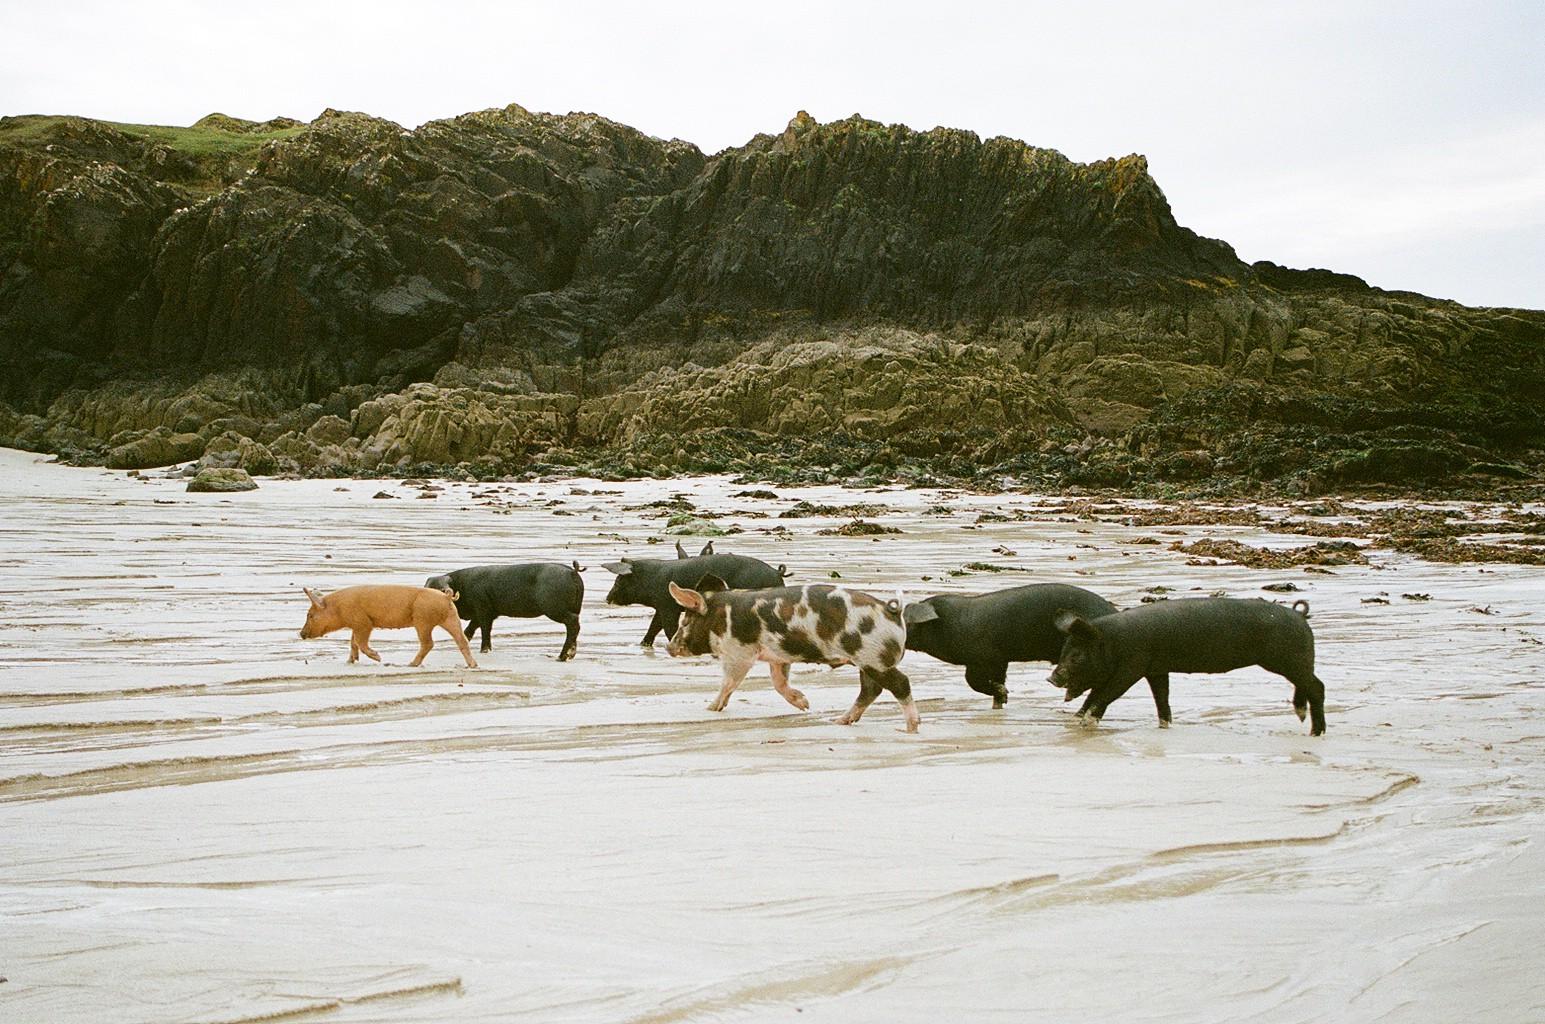 The Little Magpie Scotland Photo Diary North Coast 500 7